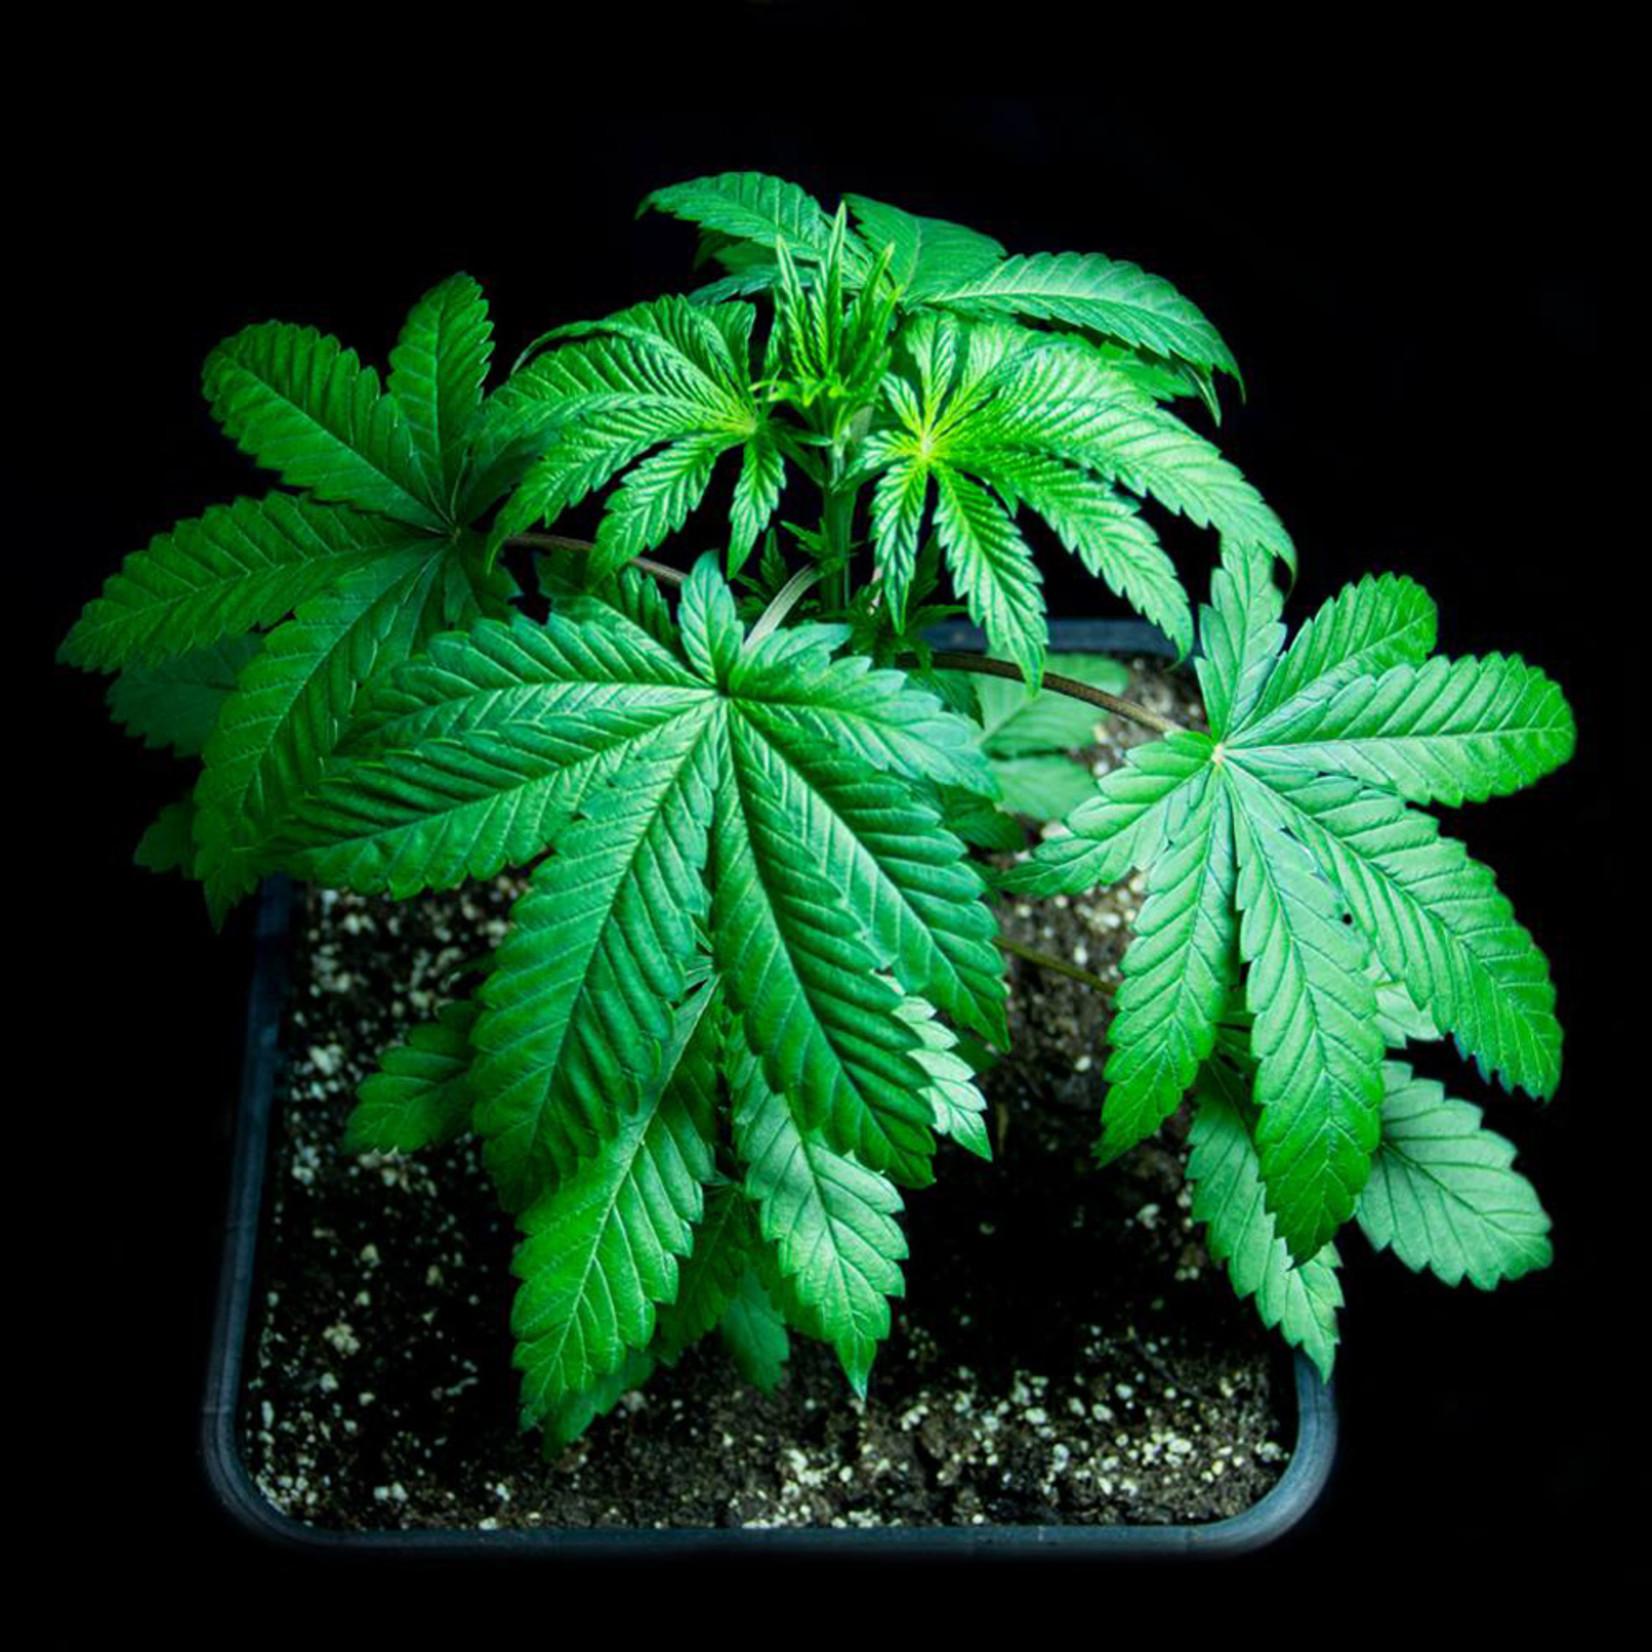 Sumo's OG Kush cannabis seeds